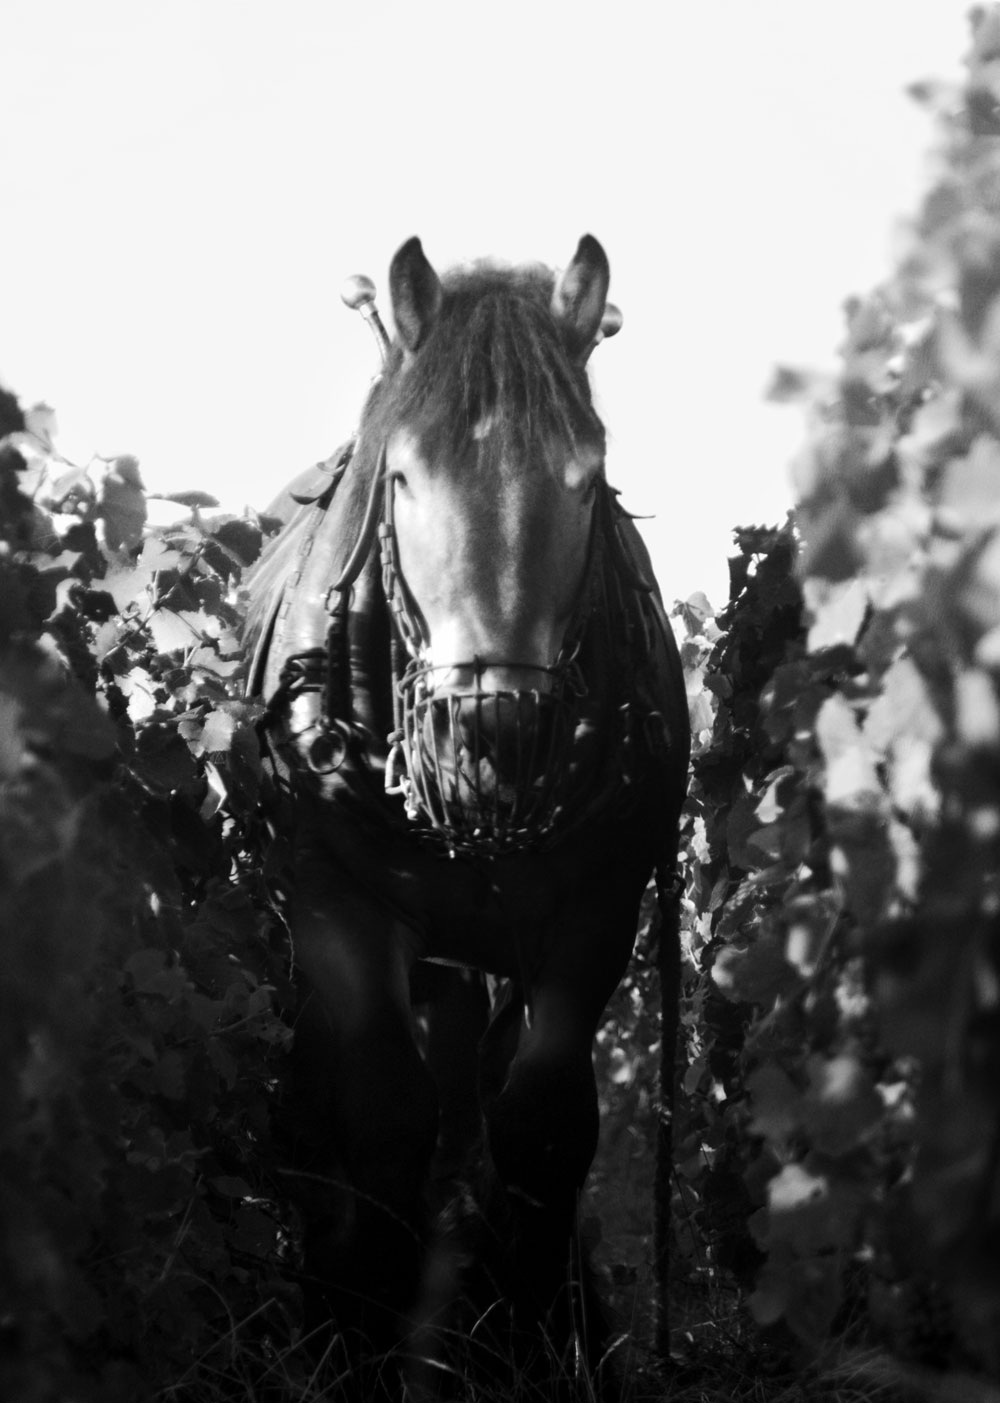 Armand de Brignac Panoramica - Armand de Brignac Champagne